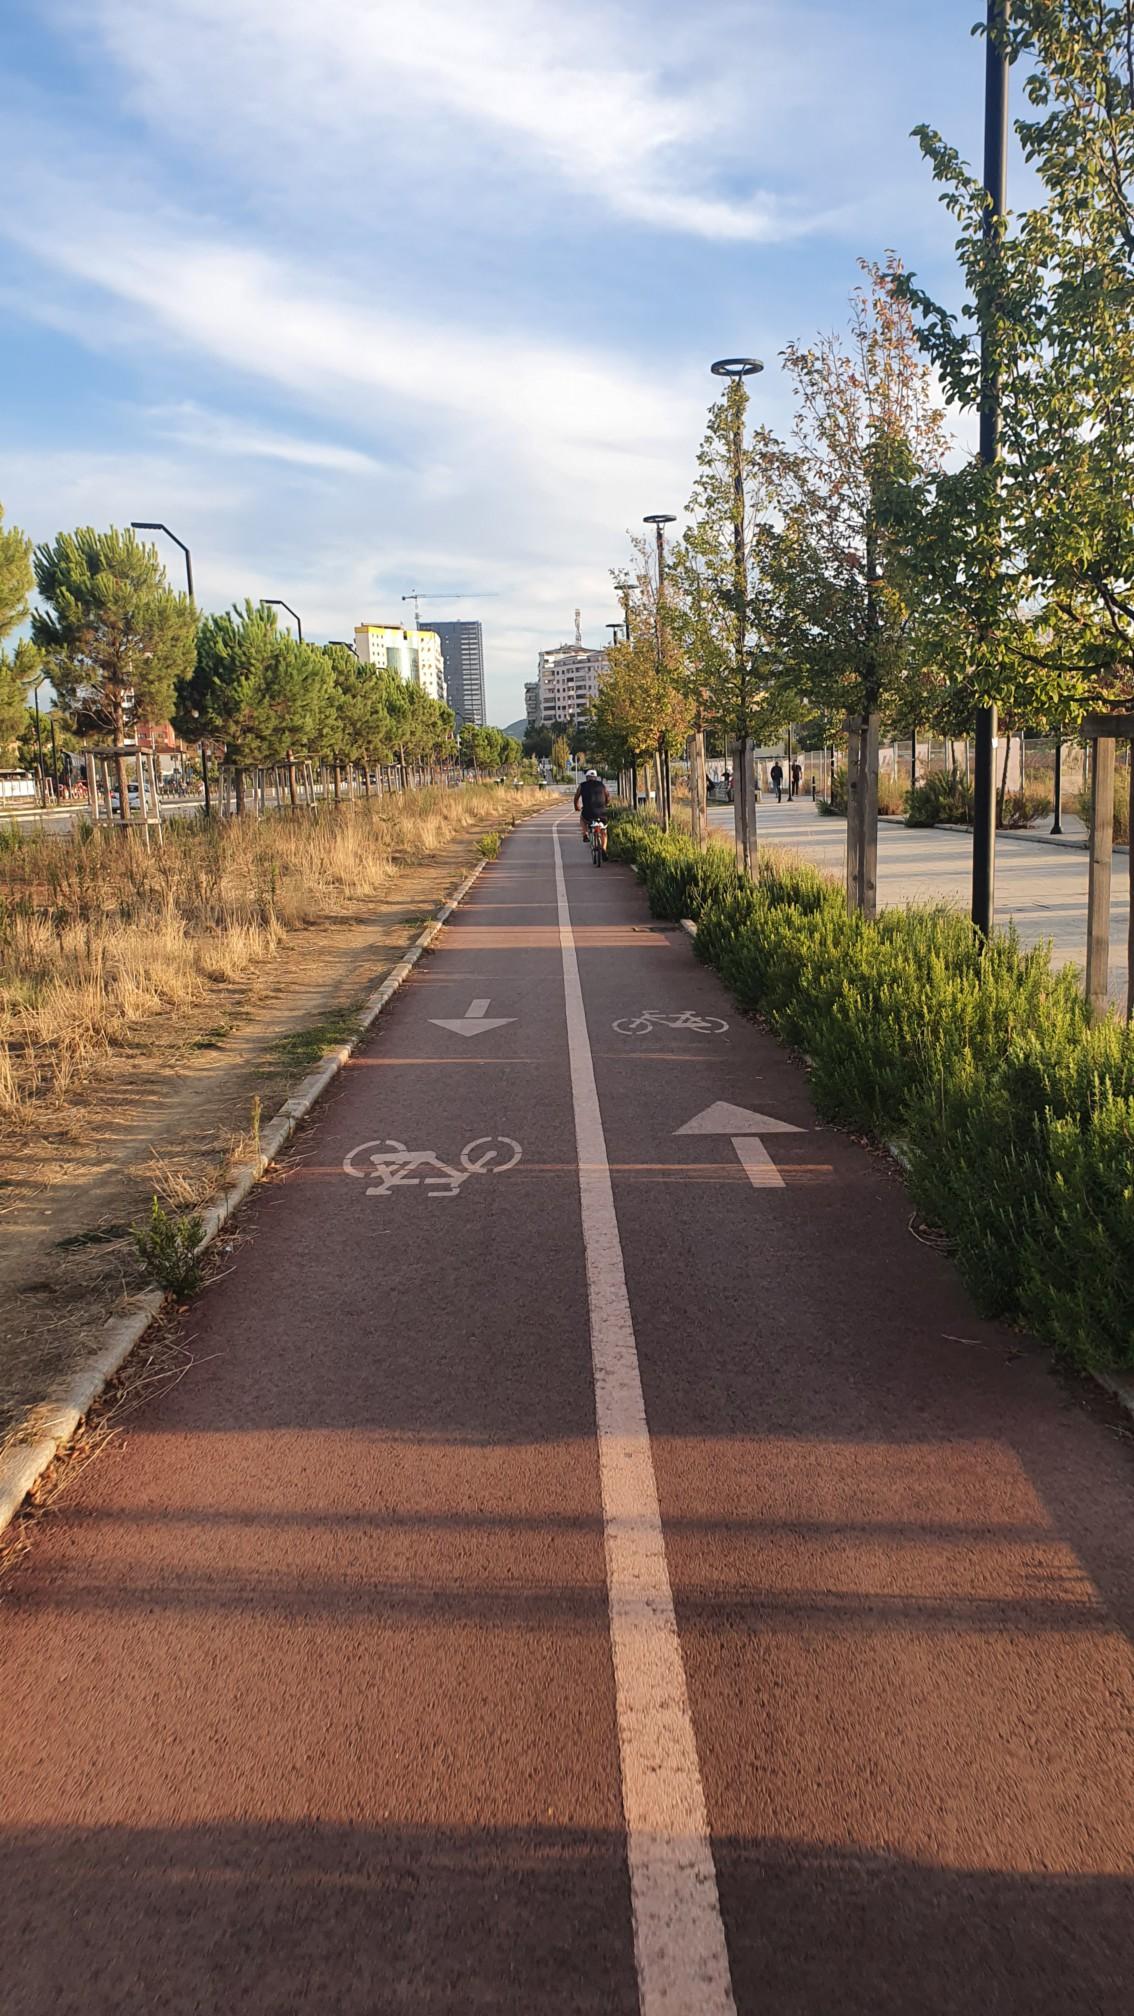 Radweg in Tirana